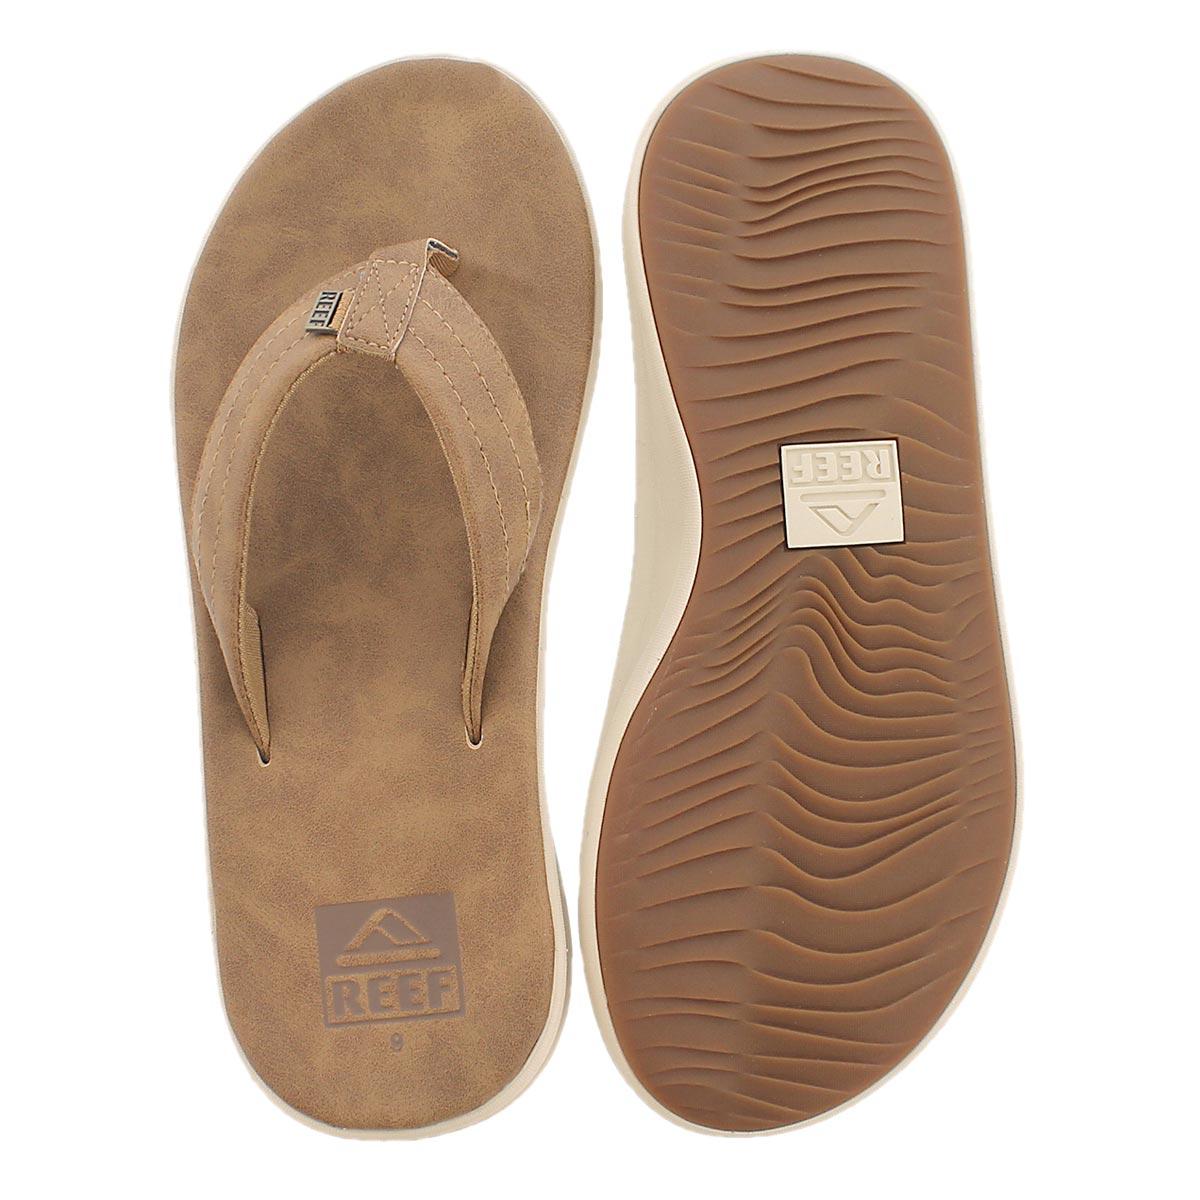 Mns Reef Rover SL brz/brn thong sandal